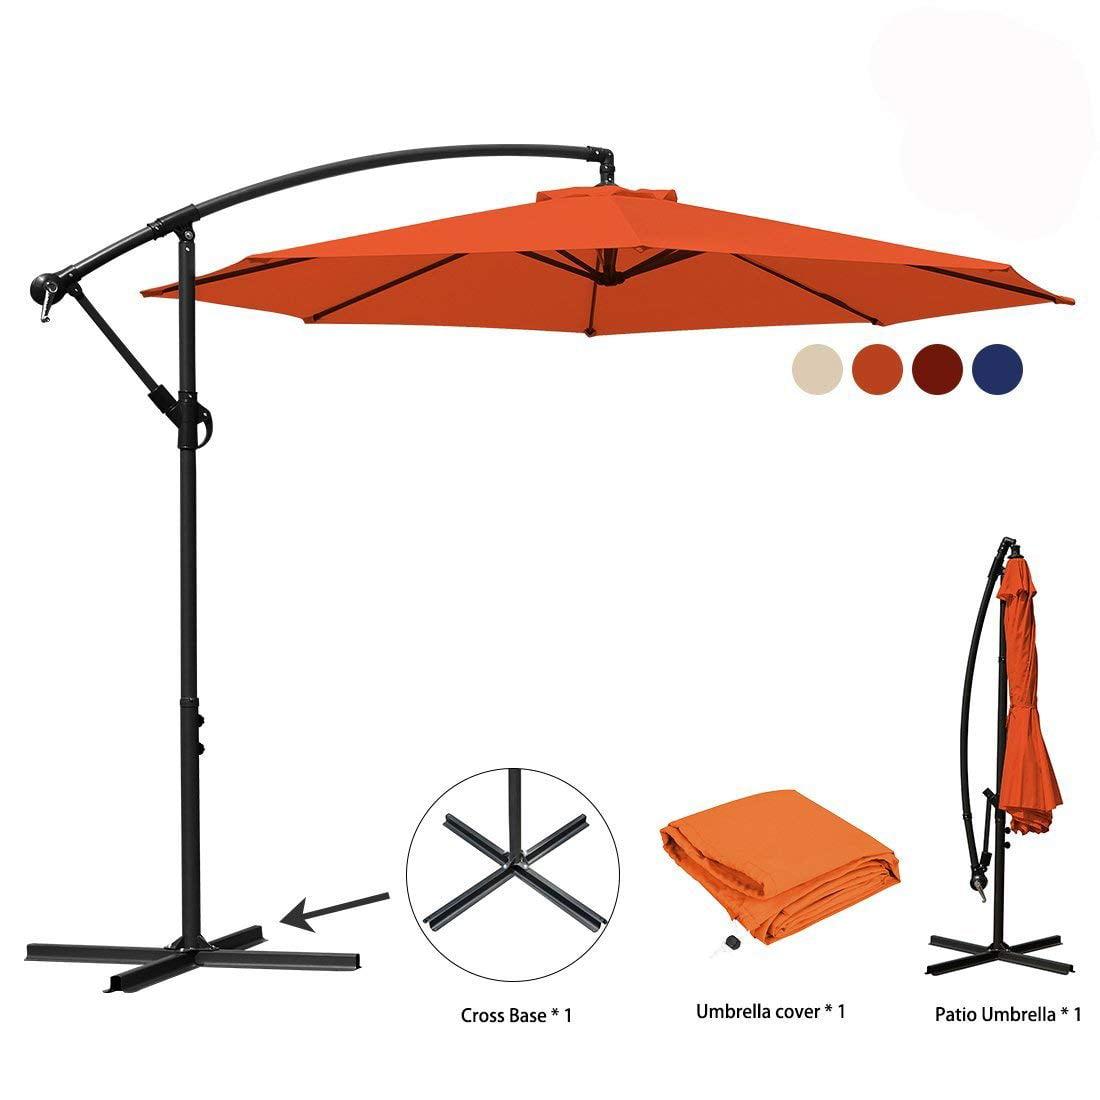 10 ft Offset Cantilever Patio Umbrella Outdoor Market Hanging Umbrellas & Crank with Cross Base, 8 Ribs (10 Ft, Navy Blue)